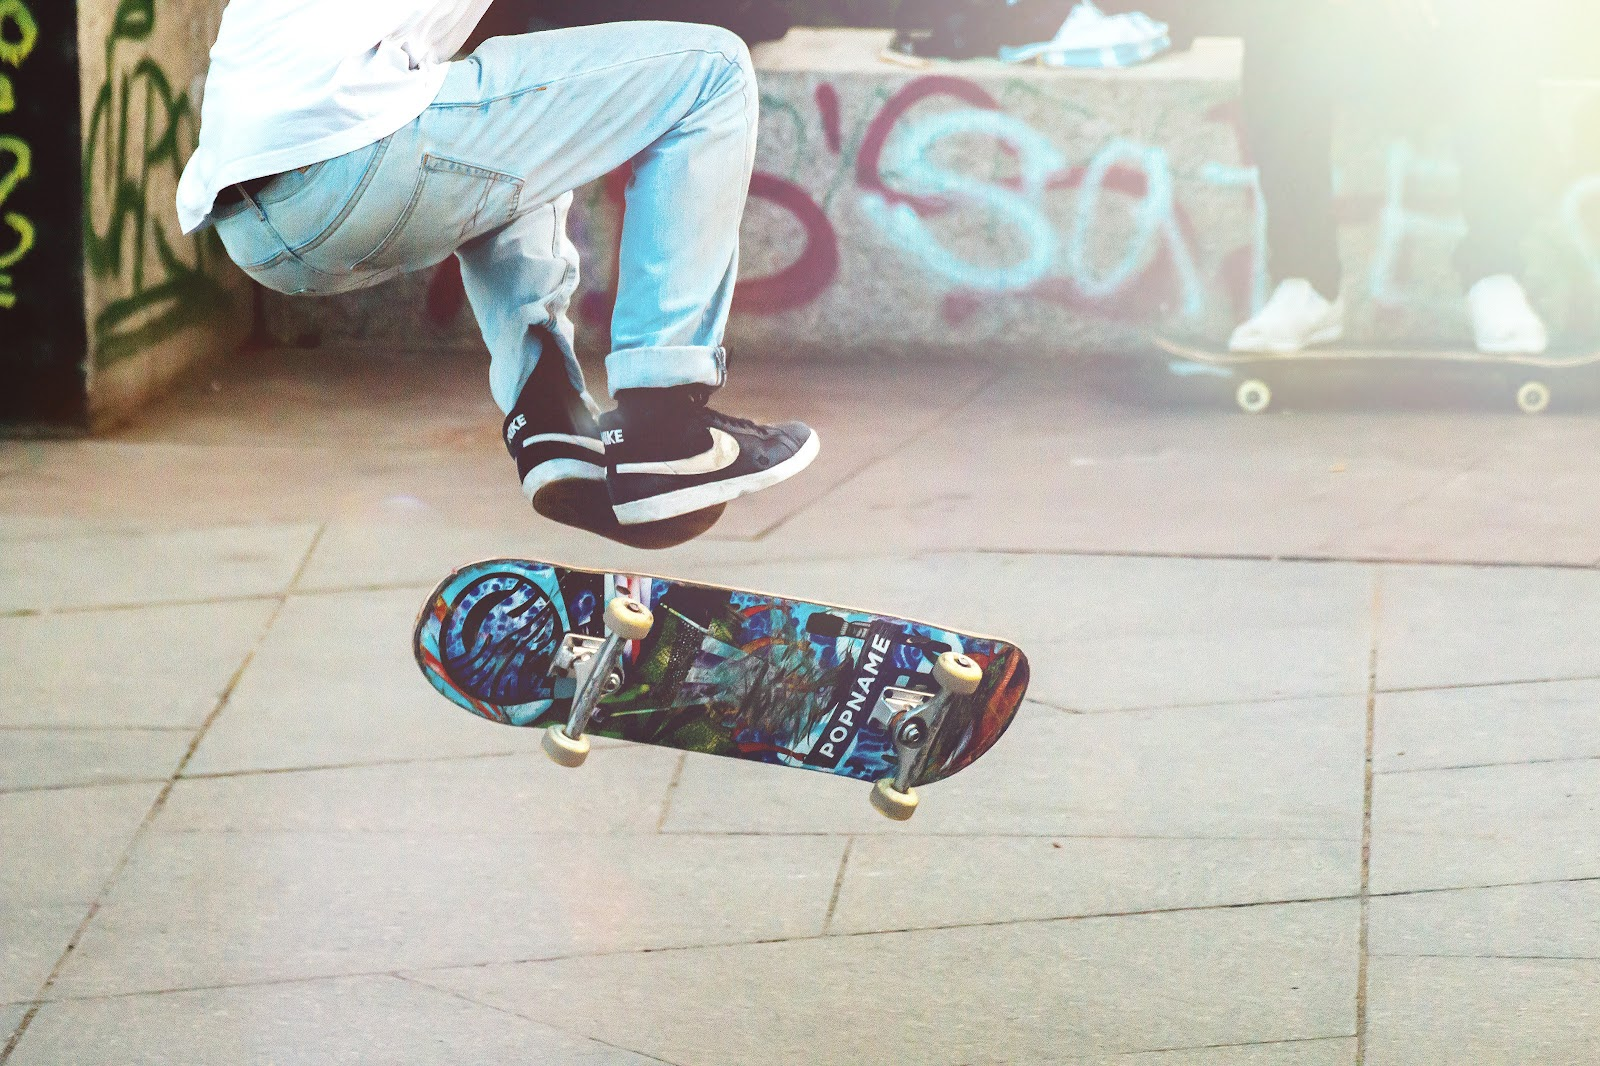 Skate boarding jump